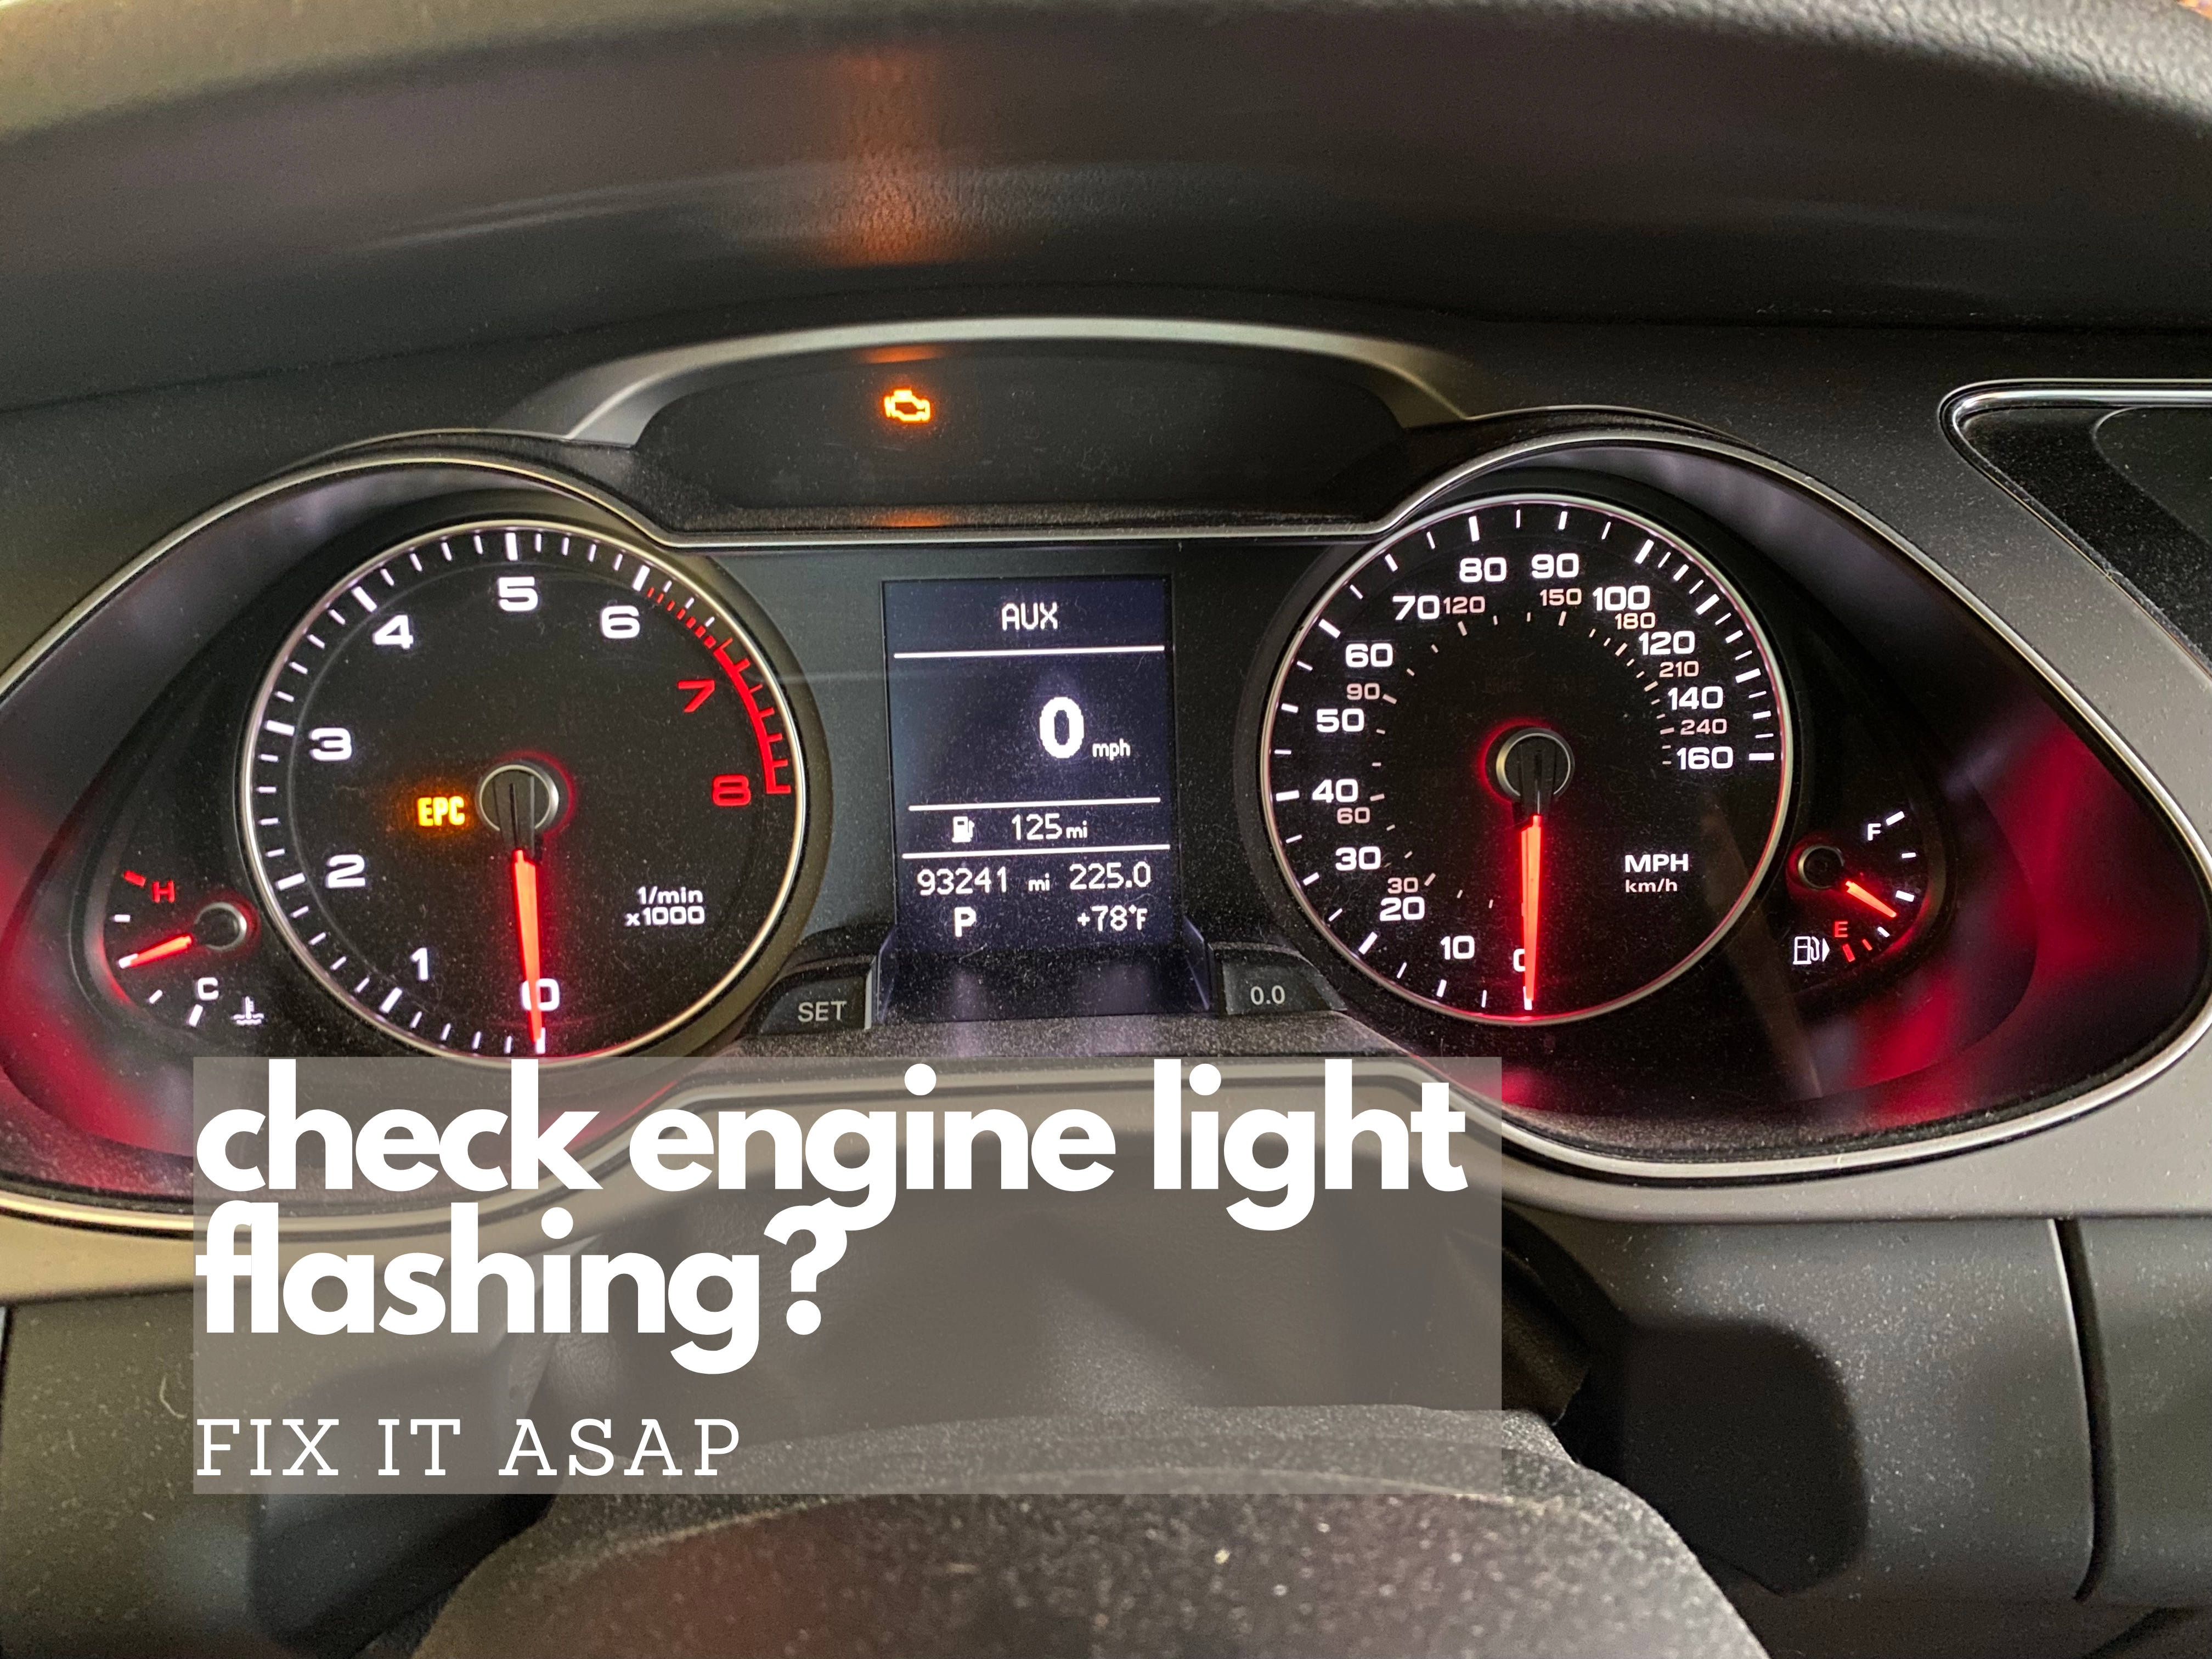 check engine light flashing on an Audi allroad